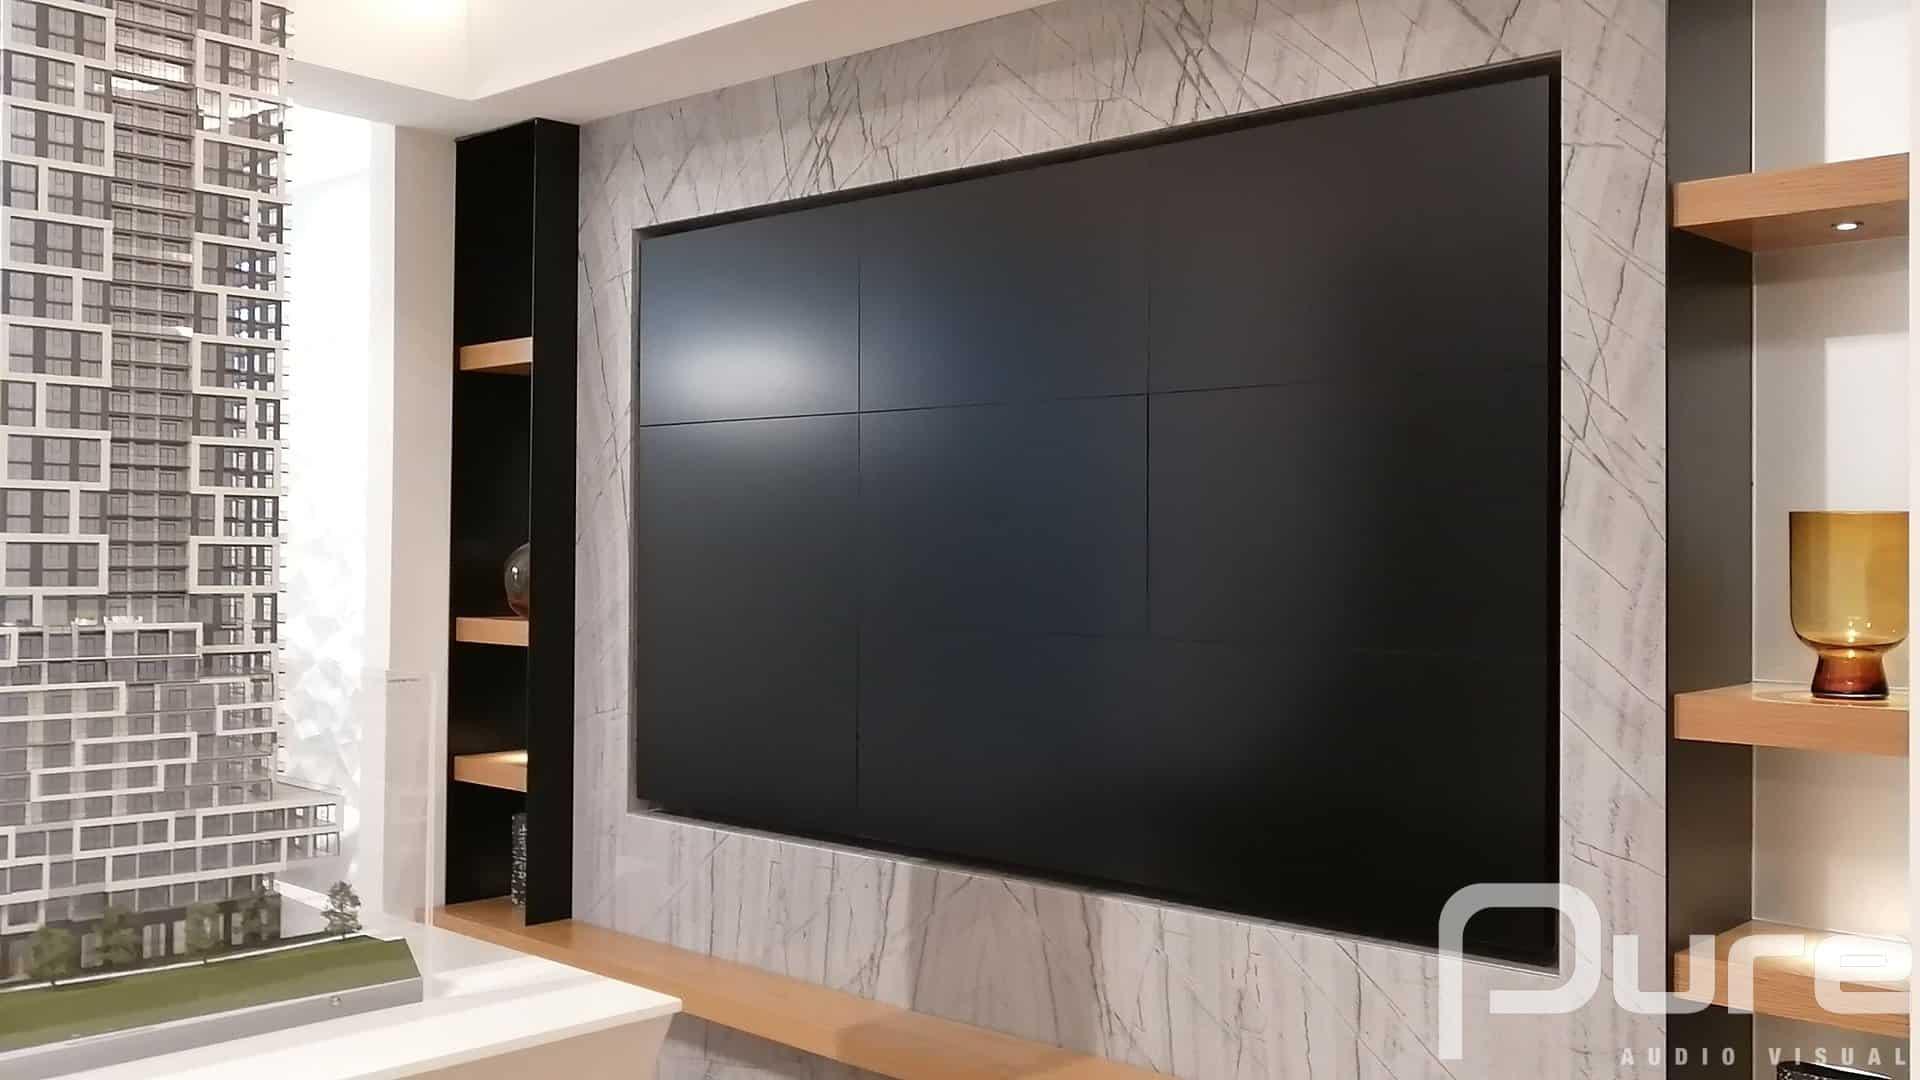 4K led wall installation